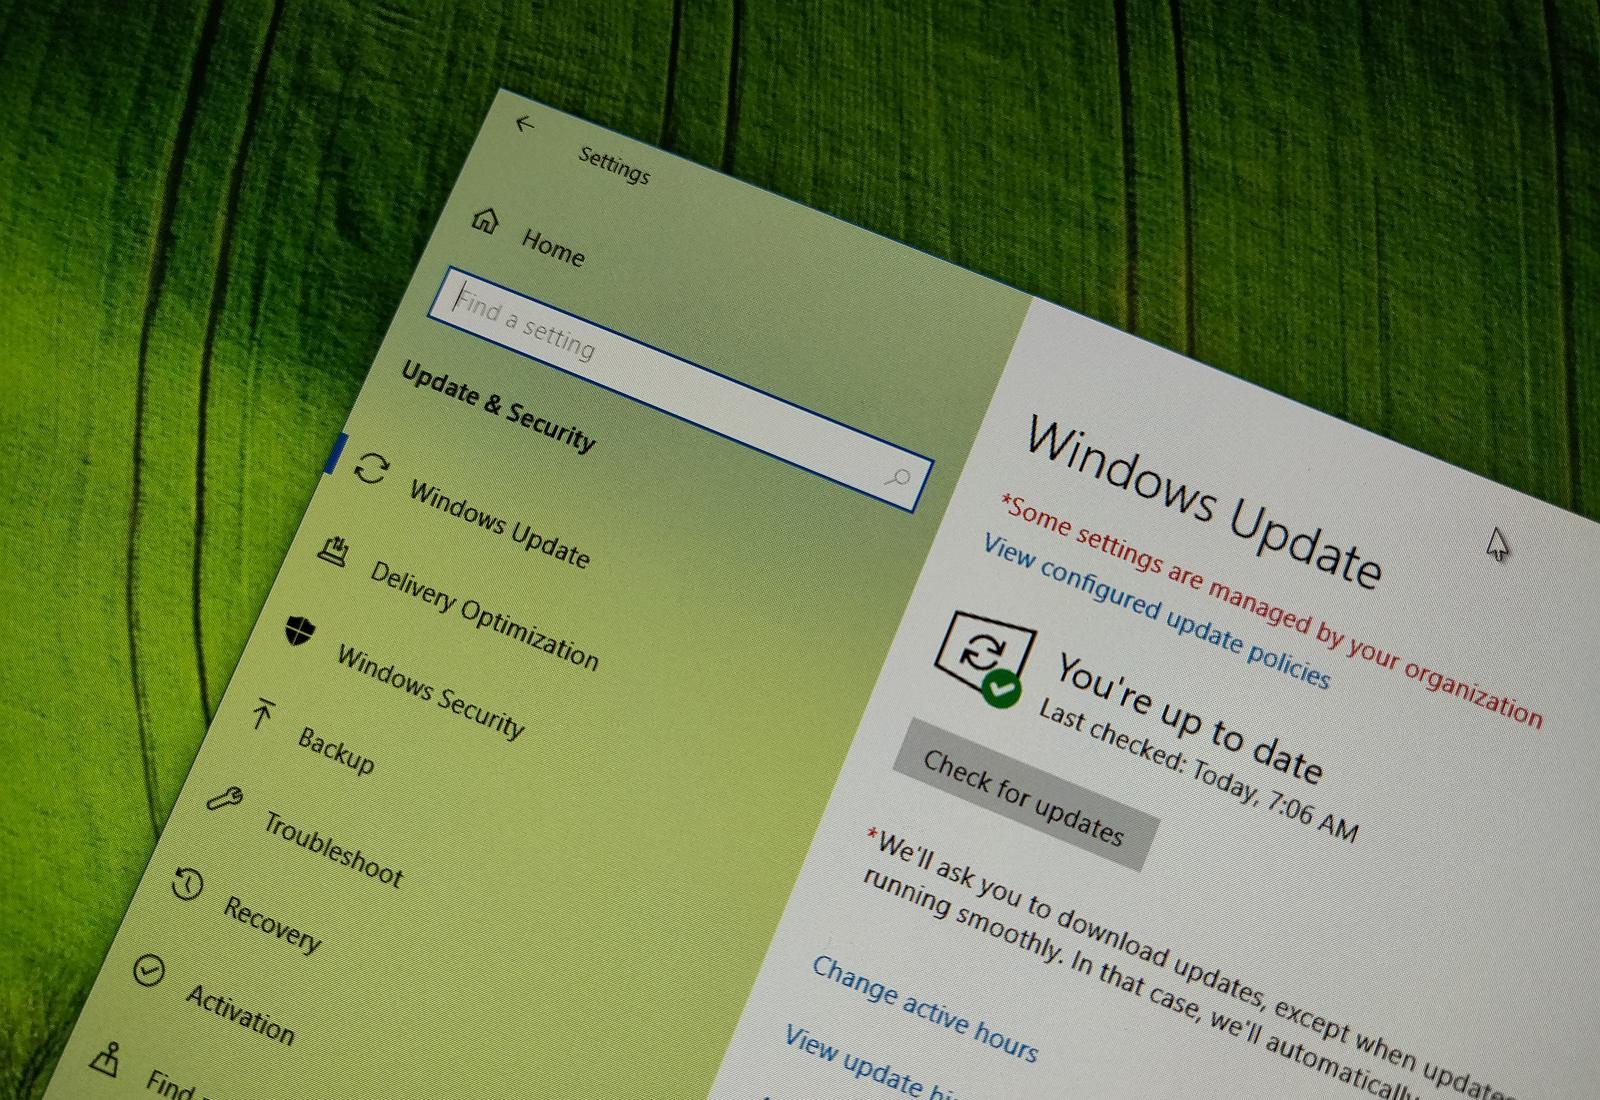 Windows 10 update settings